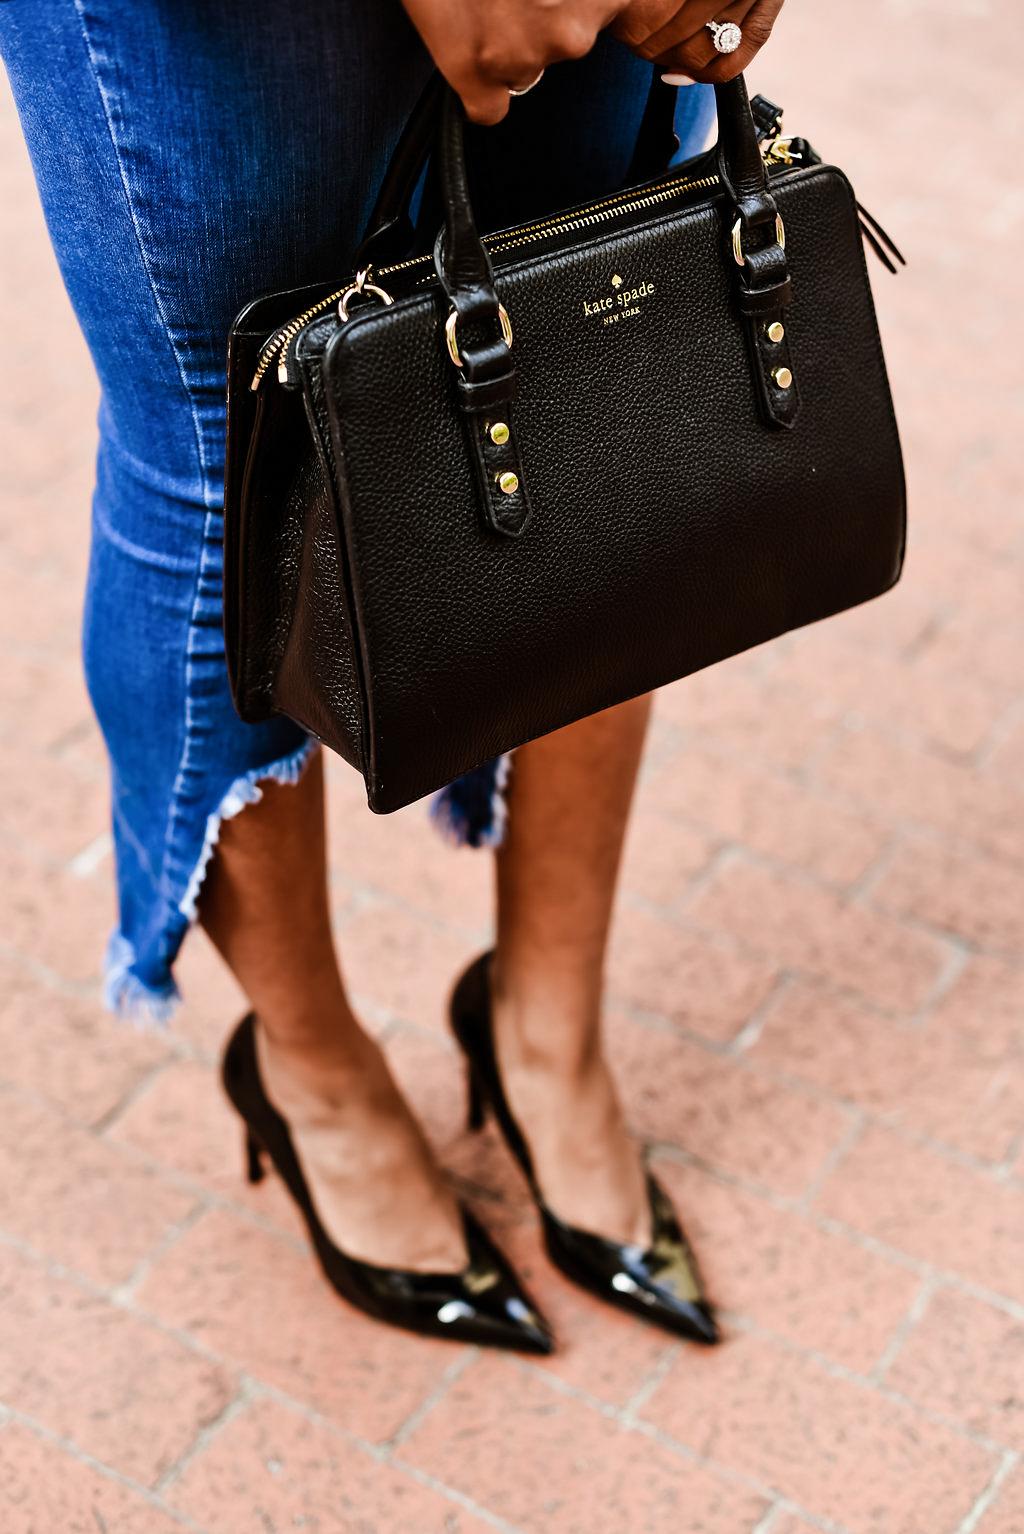 how to style a Kate spade handbag